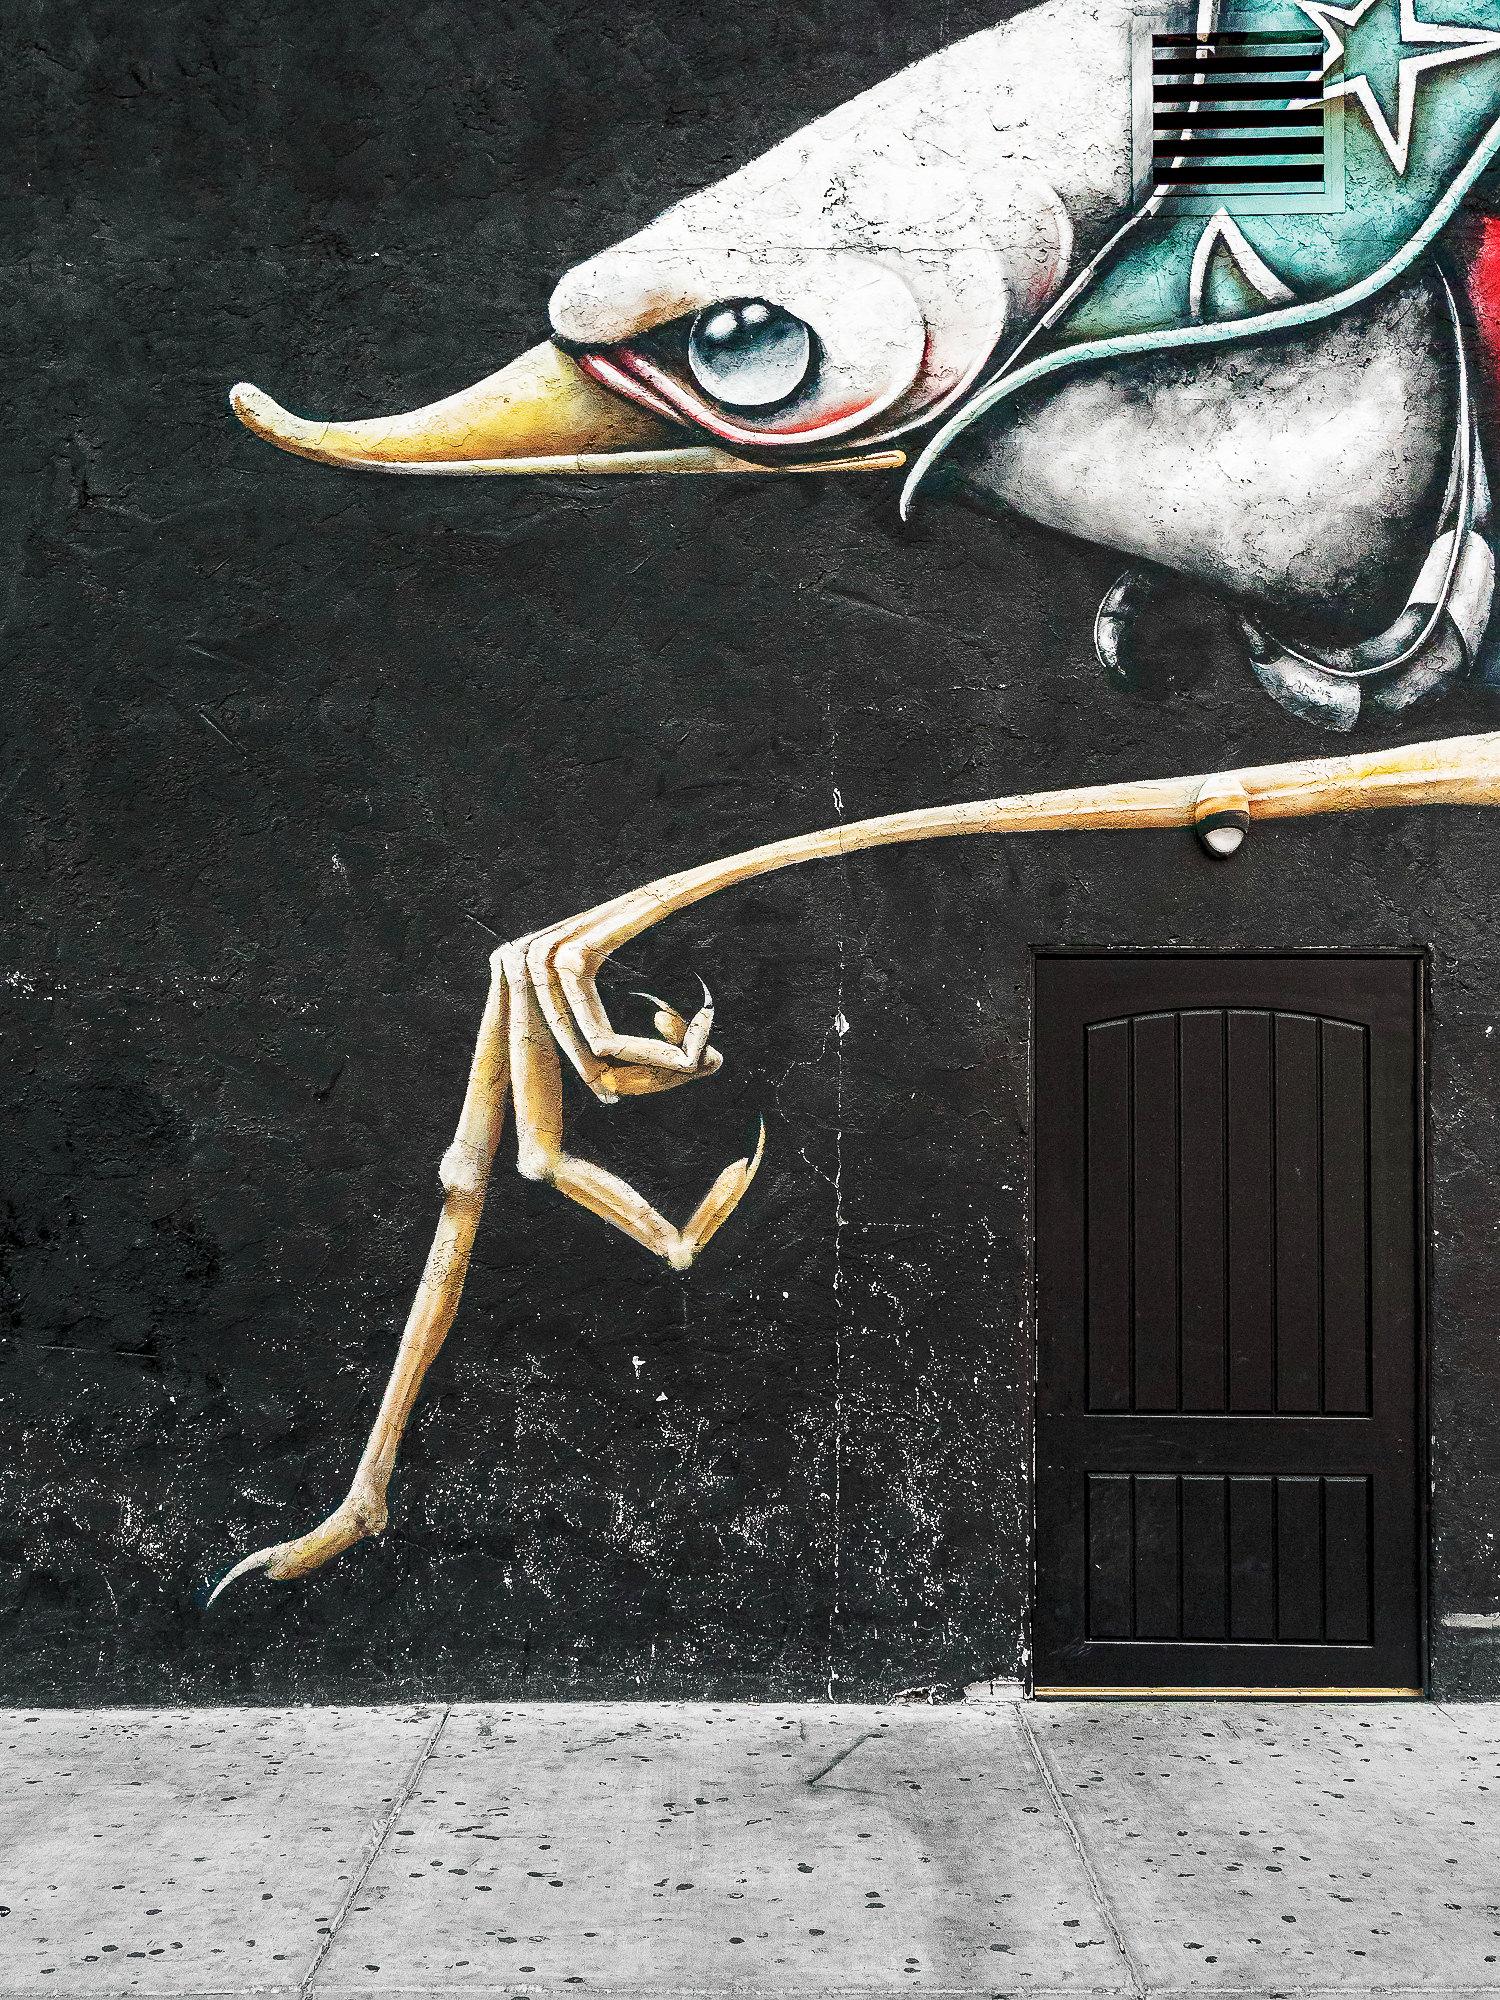 graffiti street art - San Fransisco